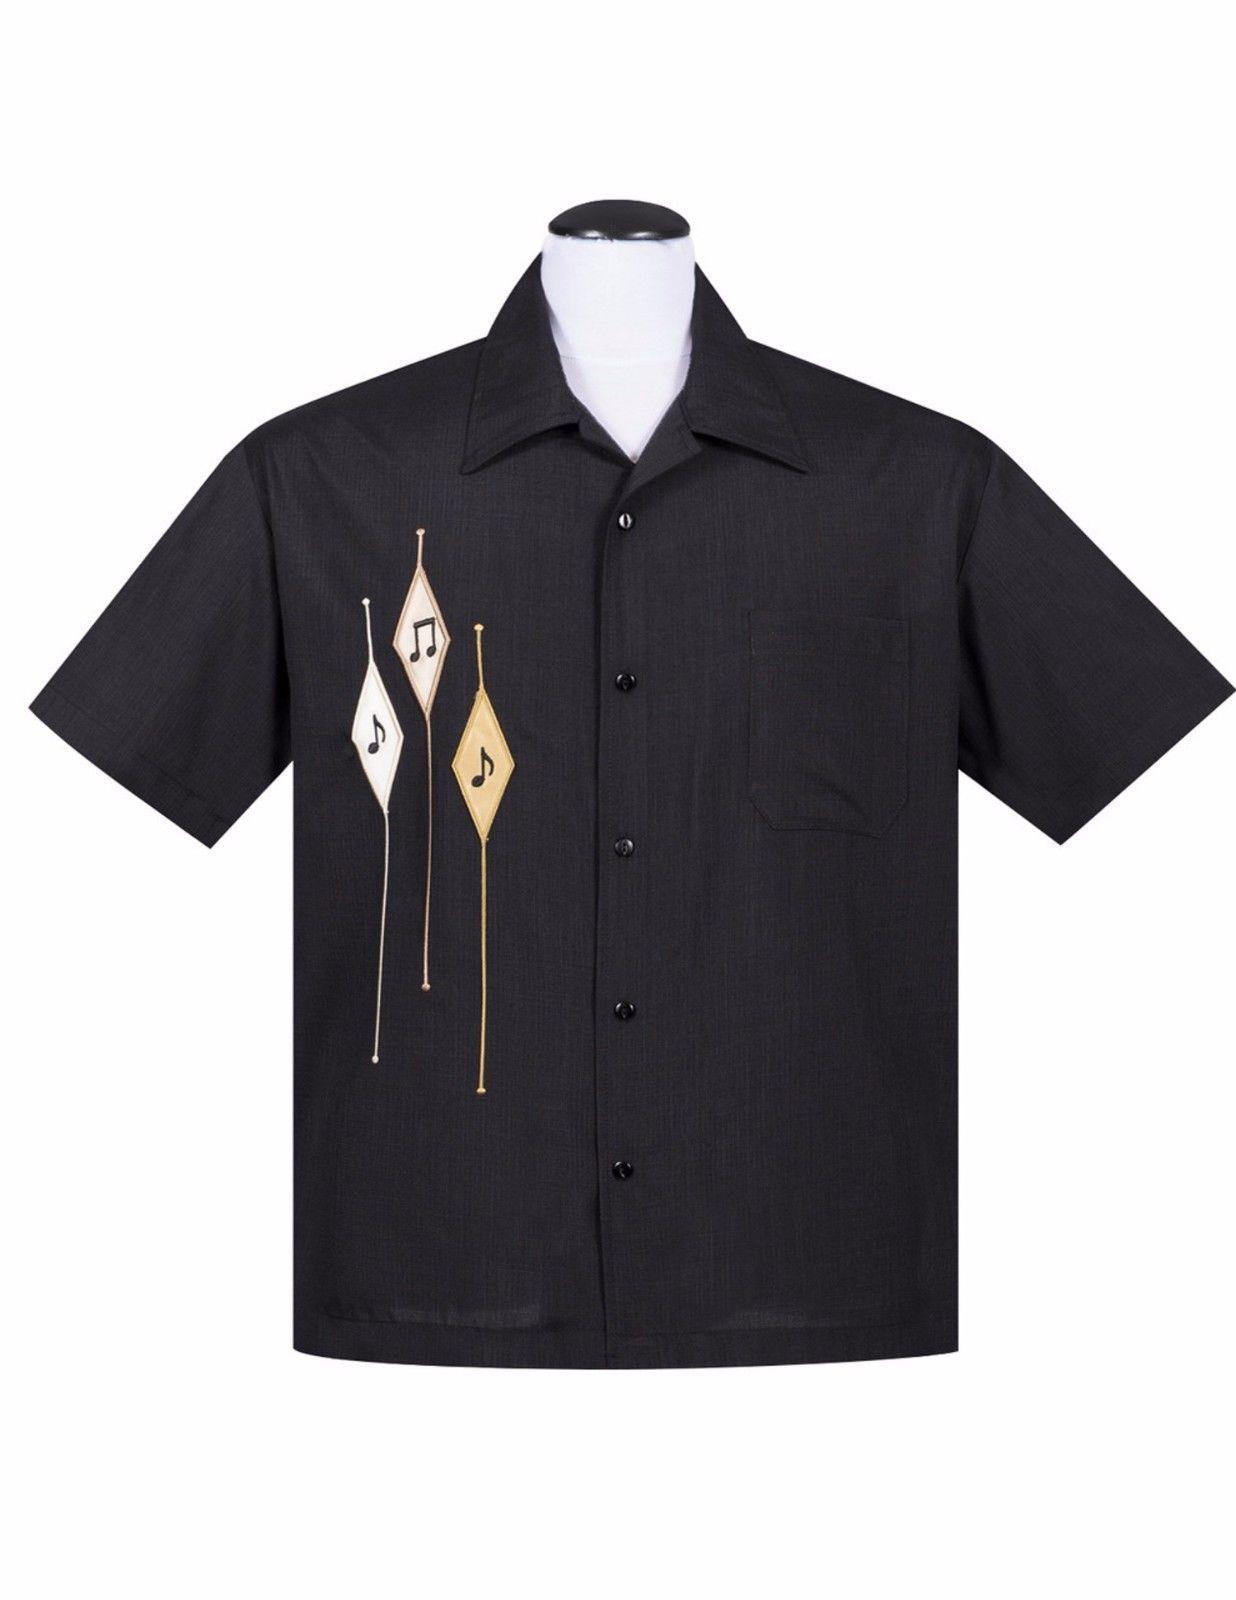 ea0bd686bab Steady Clothing Diamond Music Note Black Men s Bowling Shirt Rockabilly  Retro